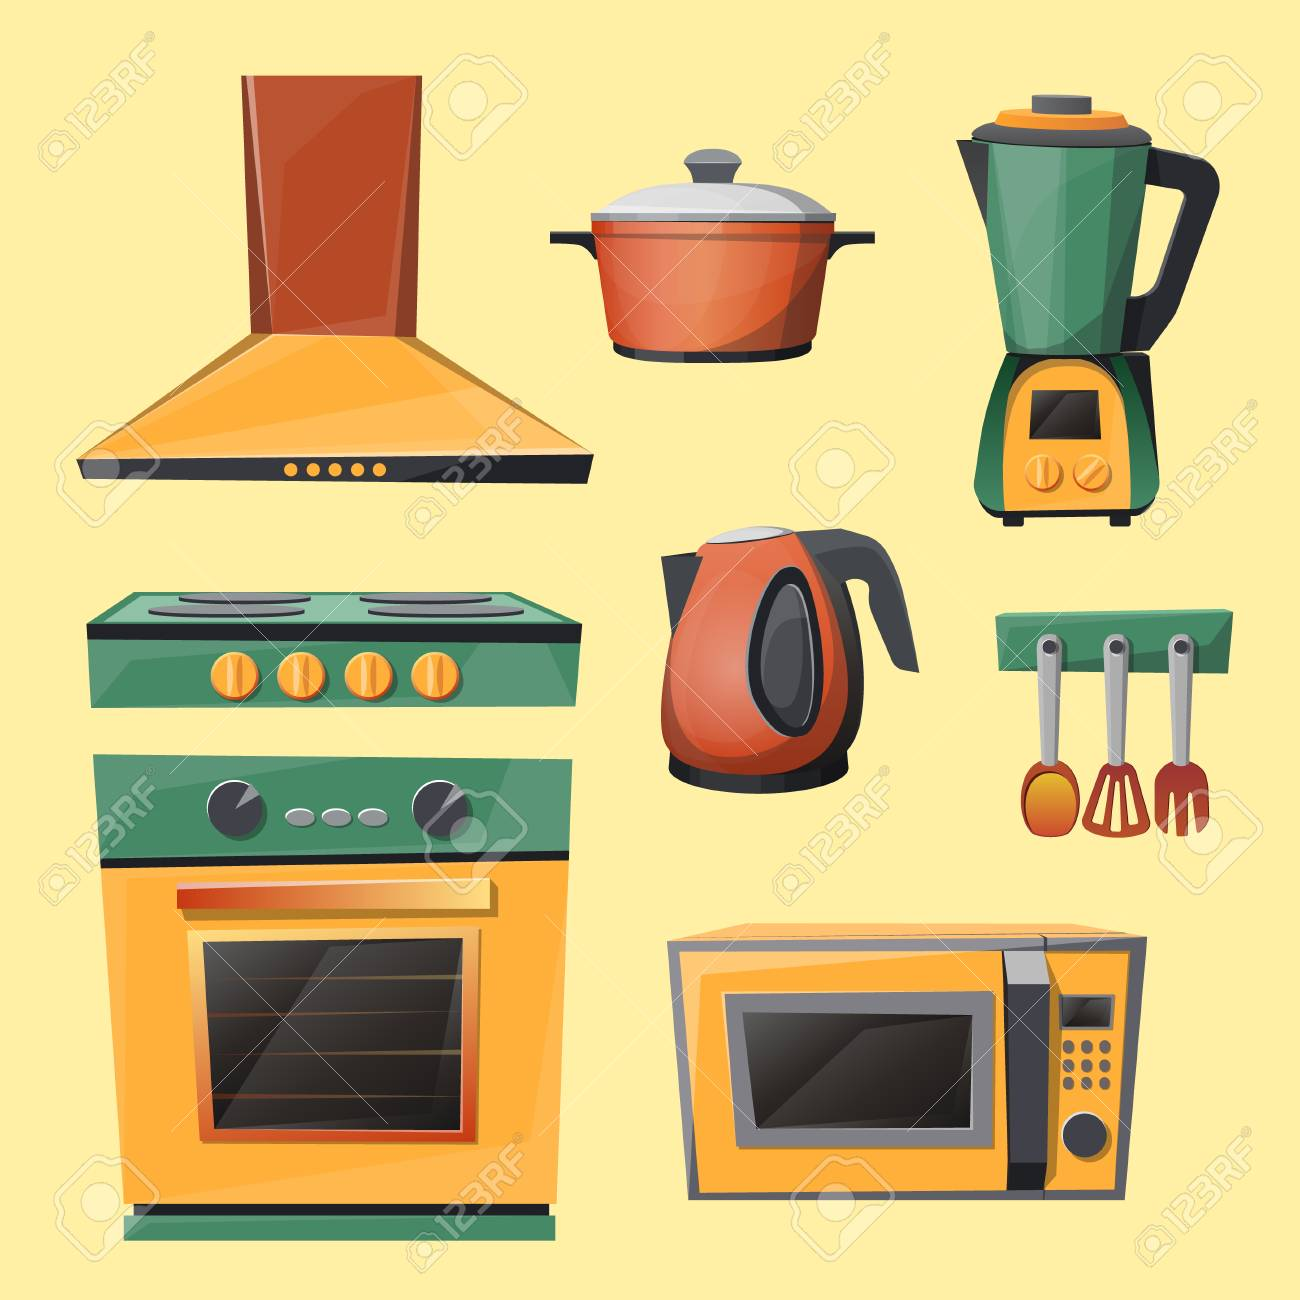 vector cartoon set of kitchen appliances microwave oven kettle